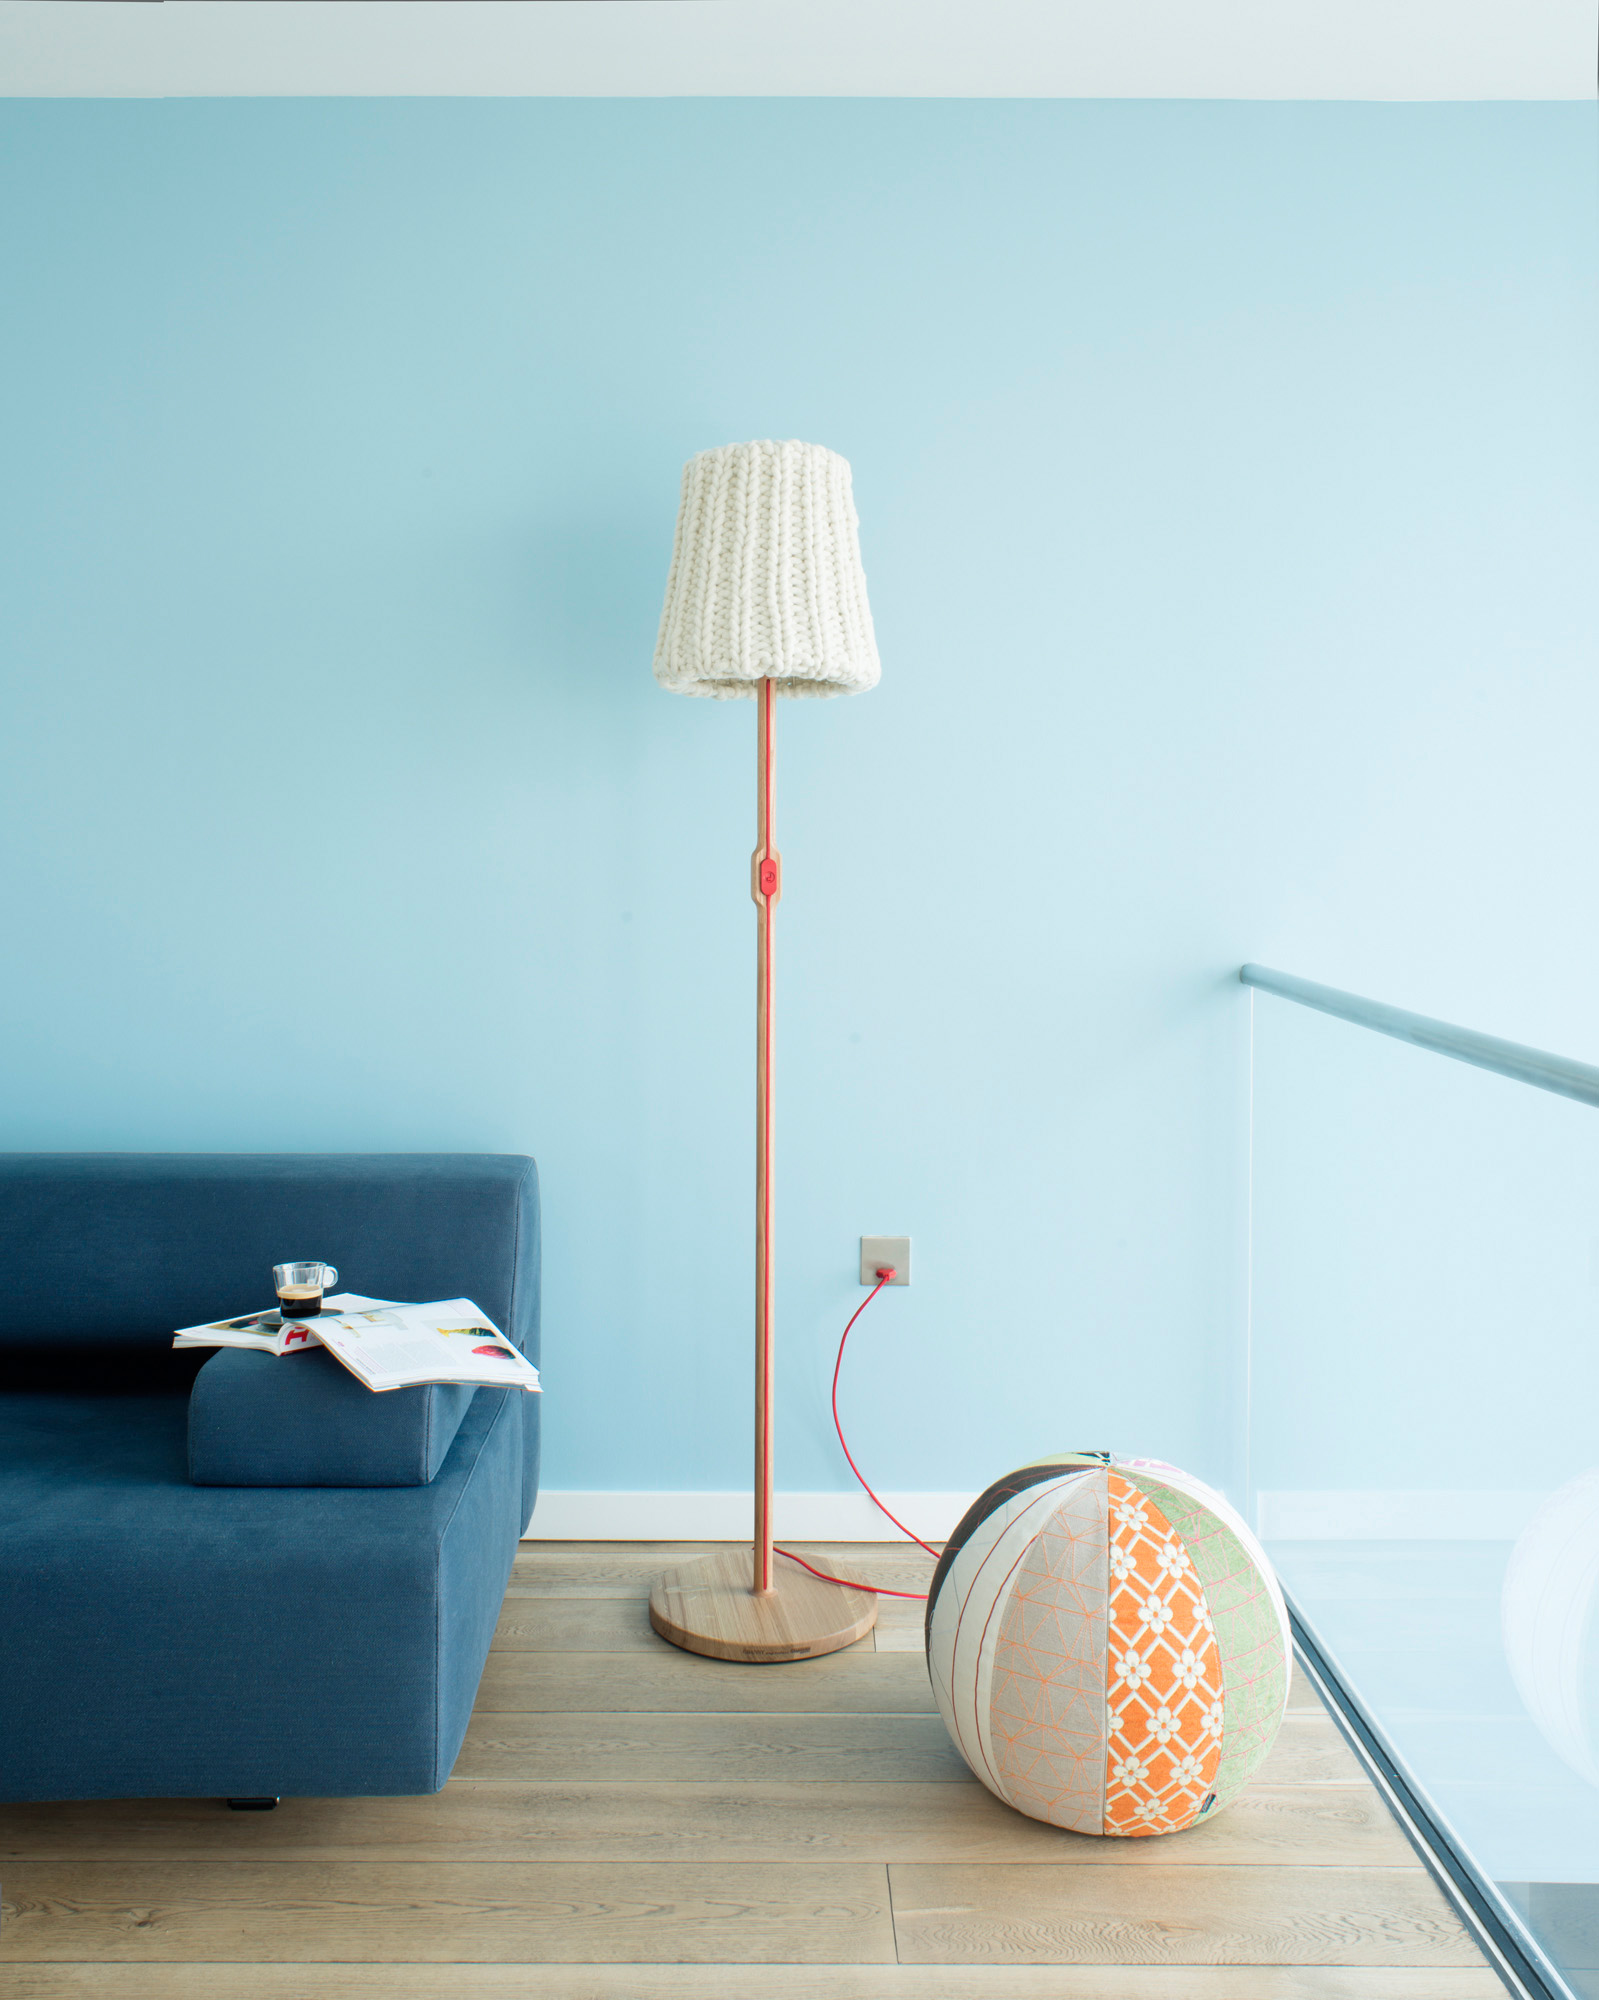 Granny floor lamp by Casamania, Joy pouf by Moroso.  Photography Justin Barton